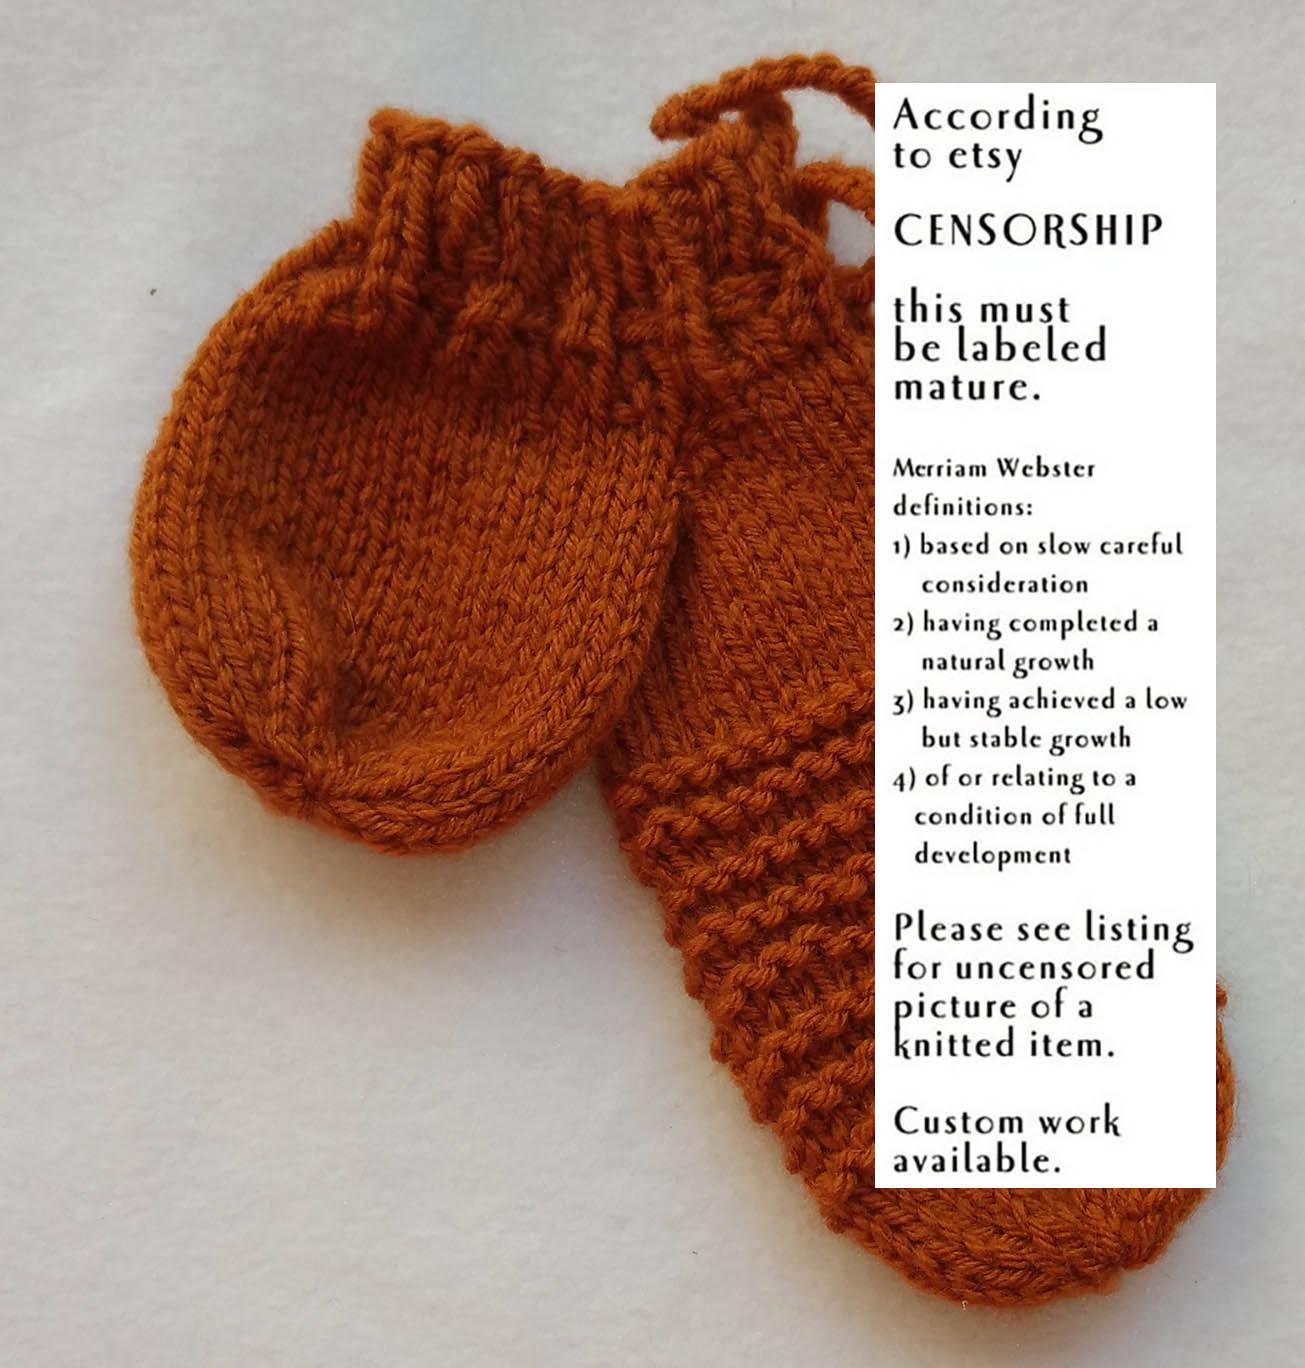 Willie Warmer Knitting Pattern Free Ginger Garter Willie Warmer Penis Cozy Knitted Willy Warmer Mature